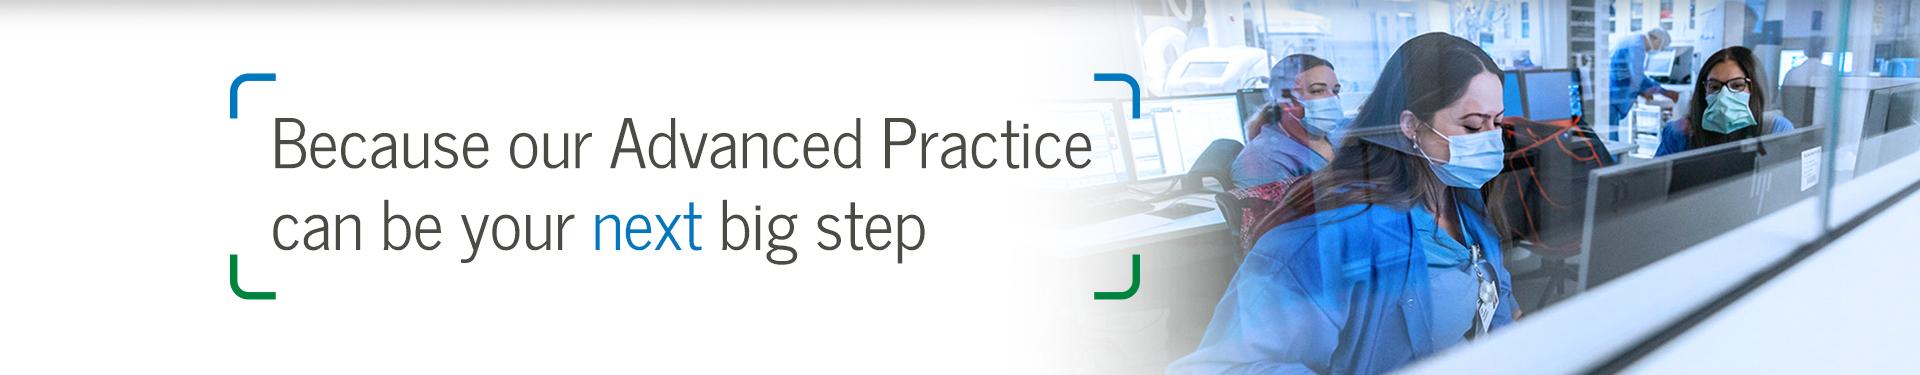 Advance Practice Home Image